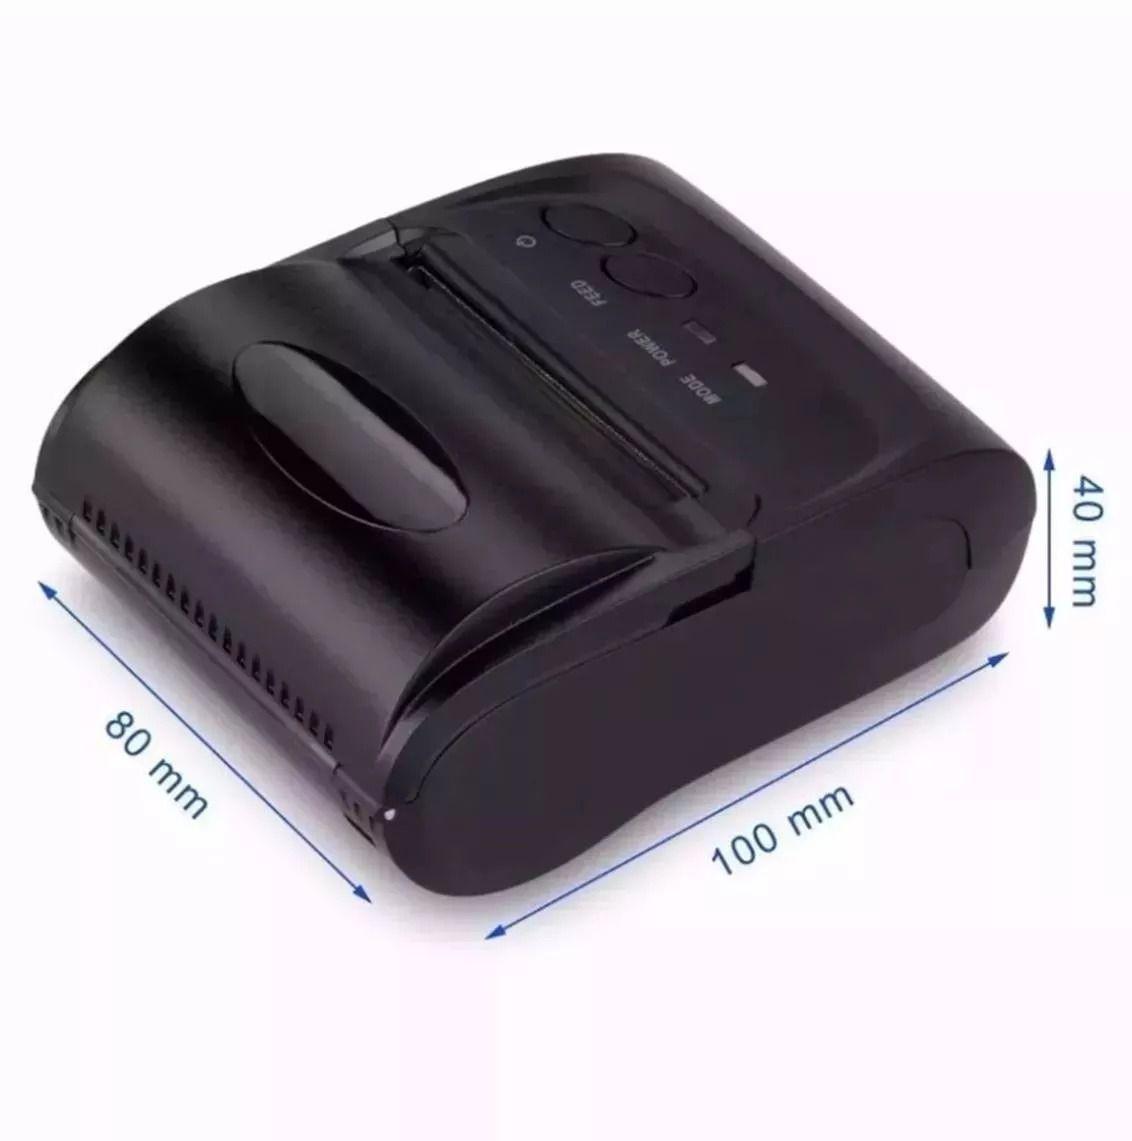 Mini Impressora Portatil Sem Fio Termica 58mm Android Ios Linux Bluetooth APP Qr Code  - HARDFAST INFORMÁTICA